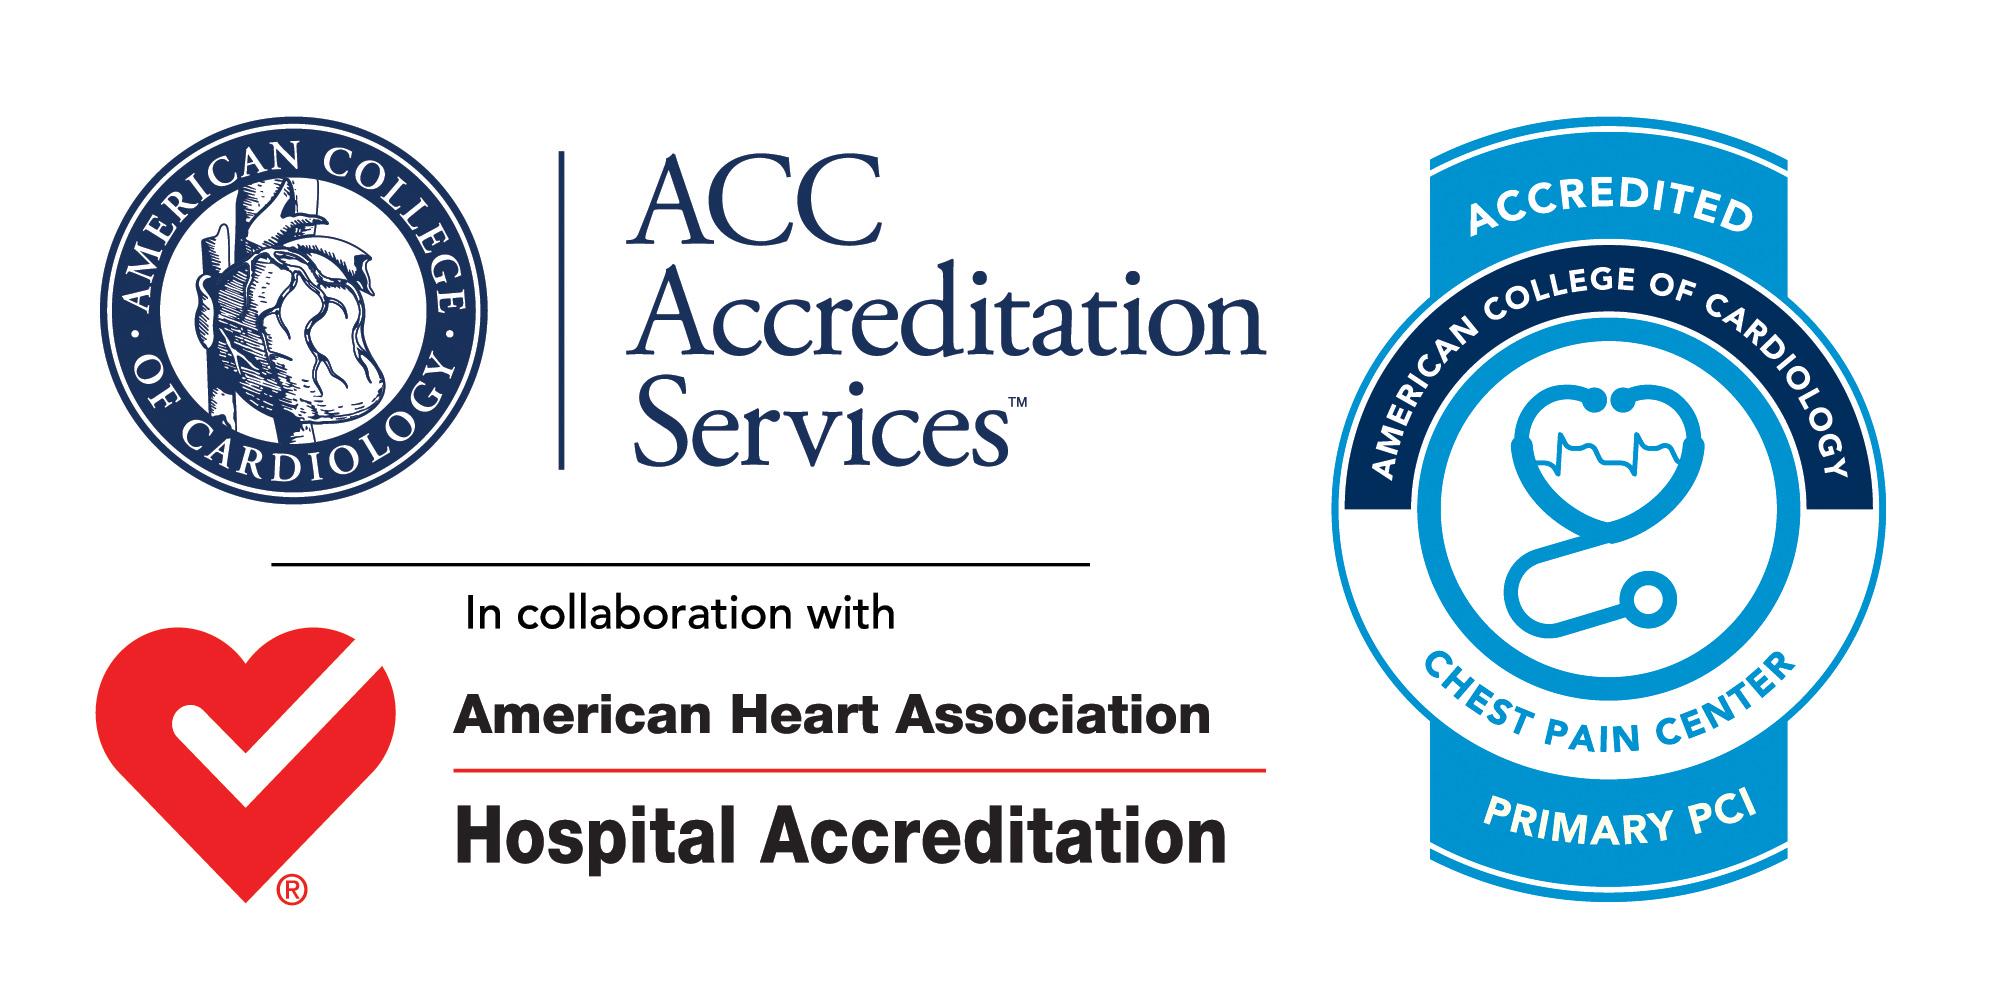 Heart Care Services in Birmingham, AL